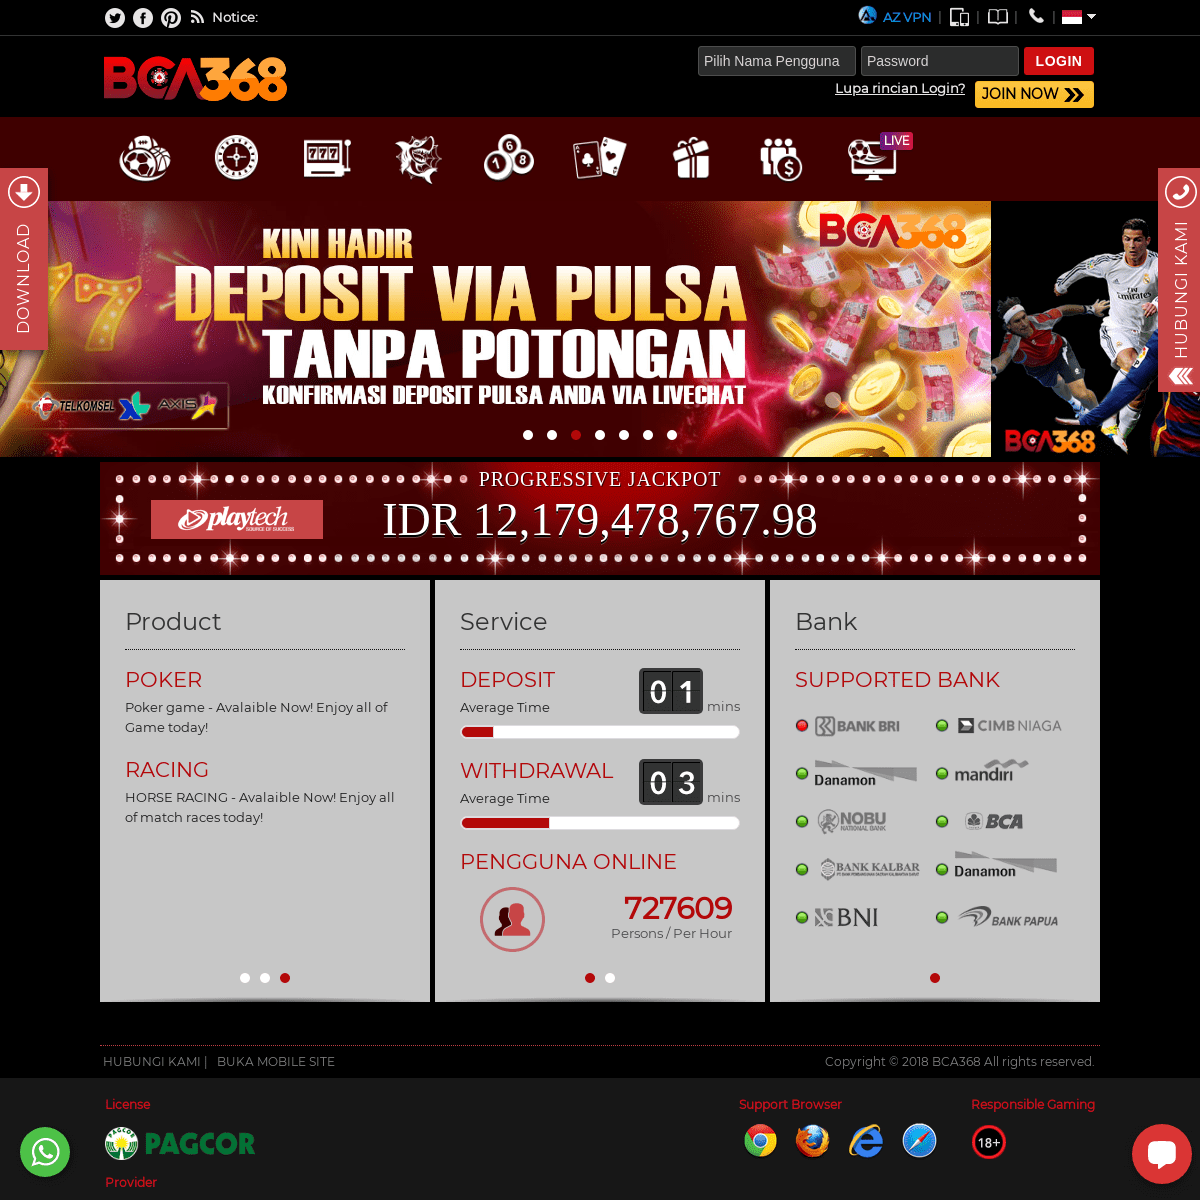 Bca368 Situs Judi Online Agen Judi Bola Sbobet Judi Slot Online